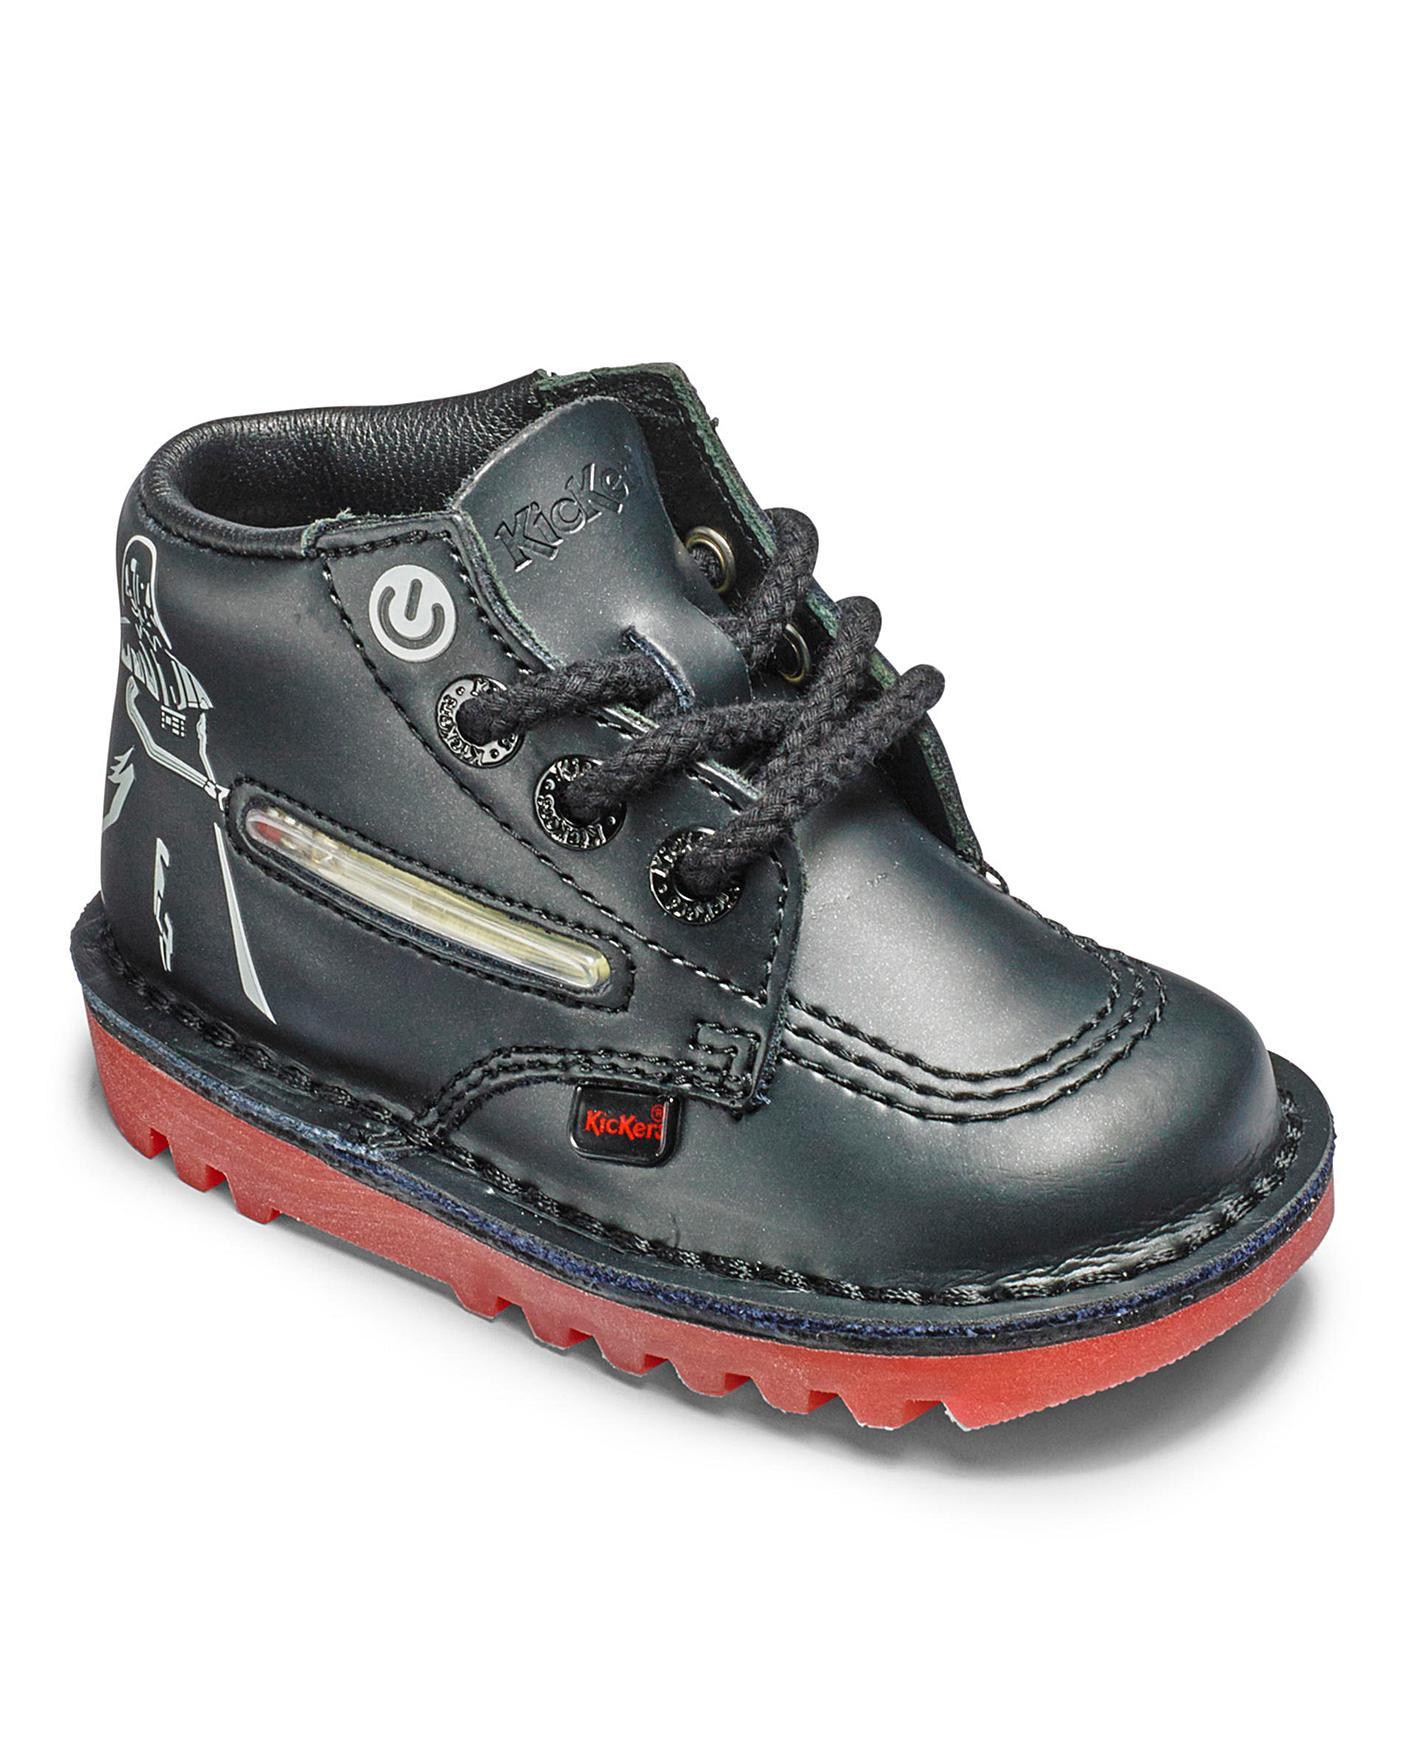 Kickers Infant Boys Vader Lightsaber Leather Black Star Wars Ankle Boots Size